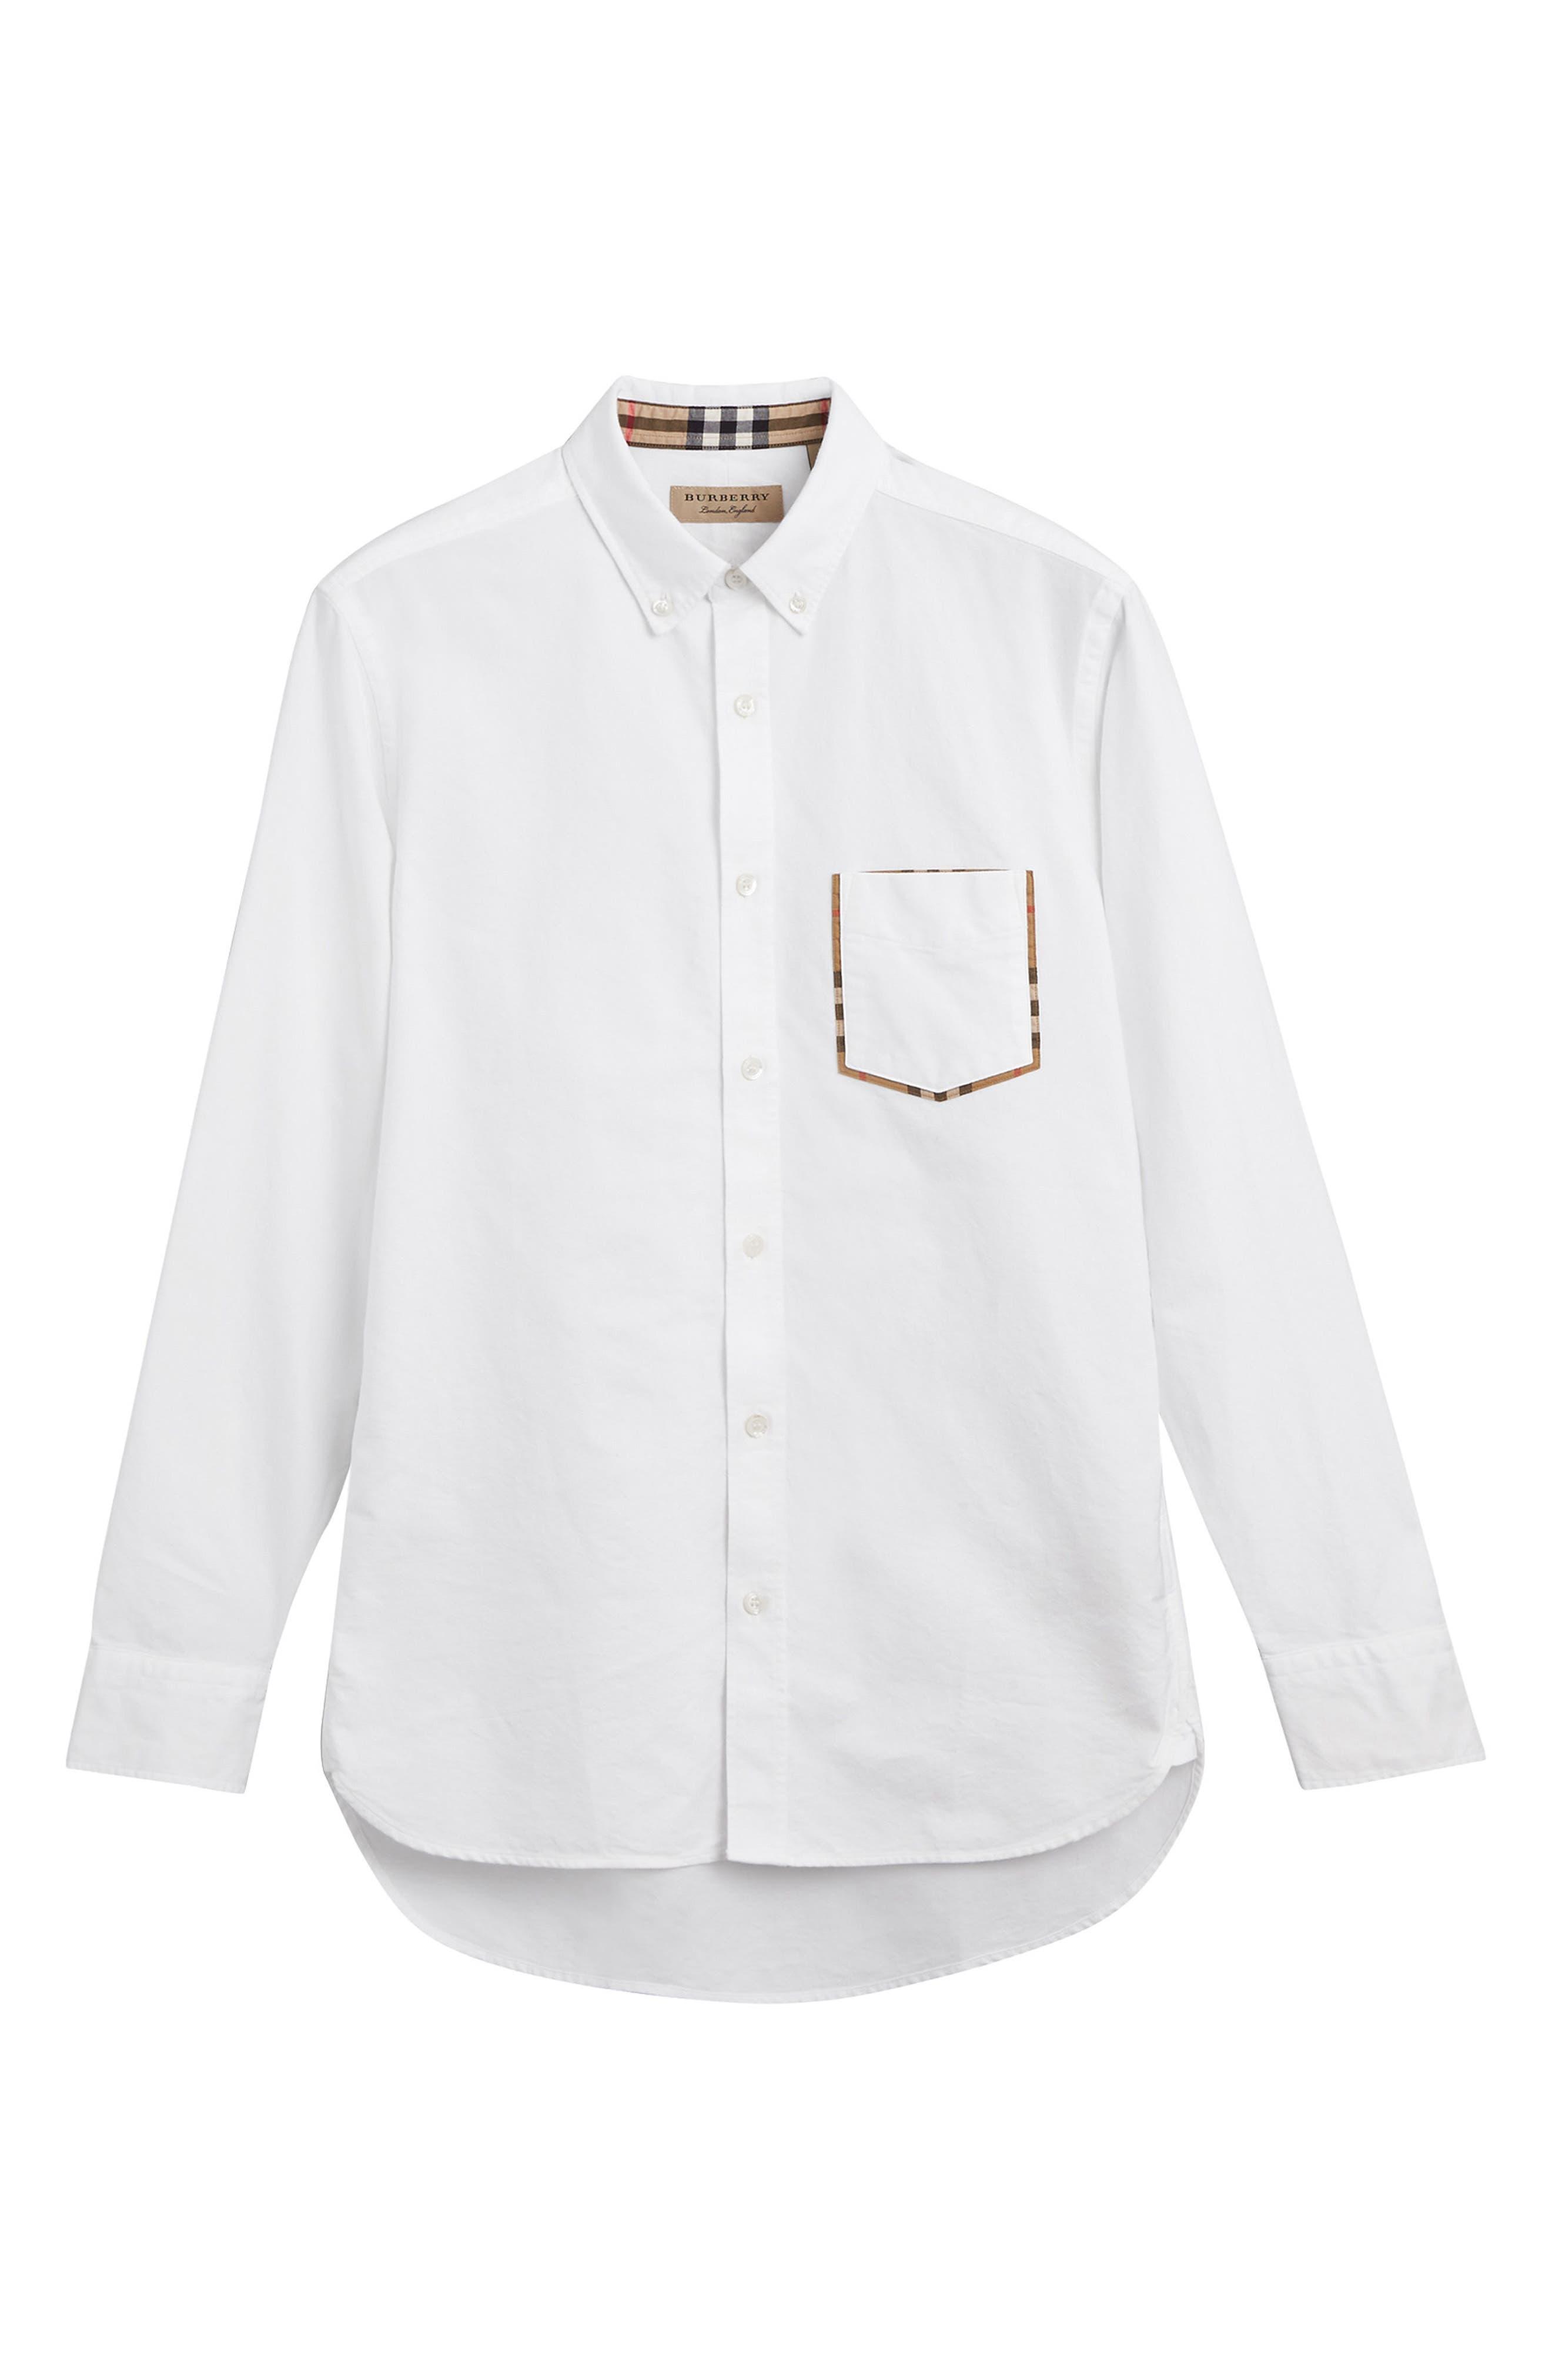 Harry Check Trim Sport Shirt,                             Alternate thumbnail 5, color,                             WHITE